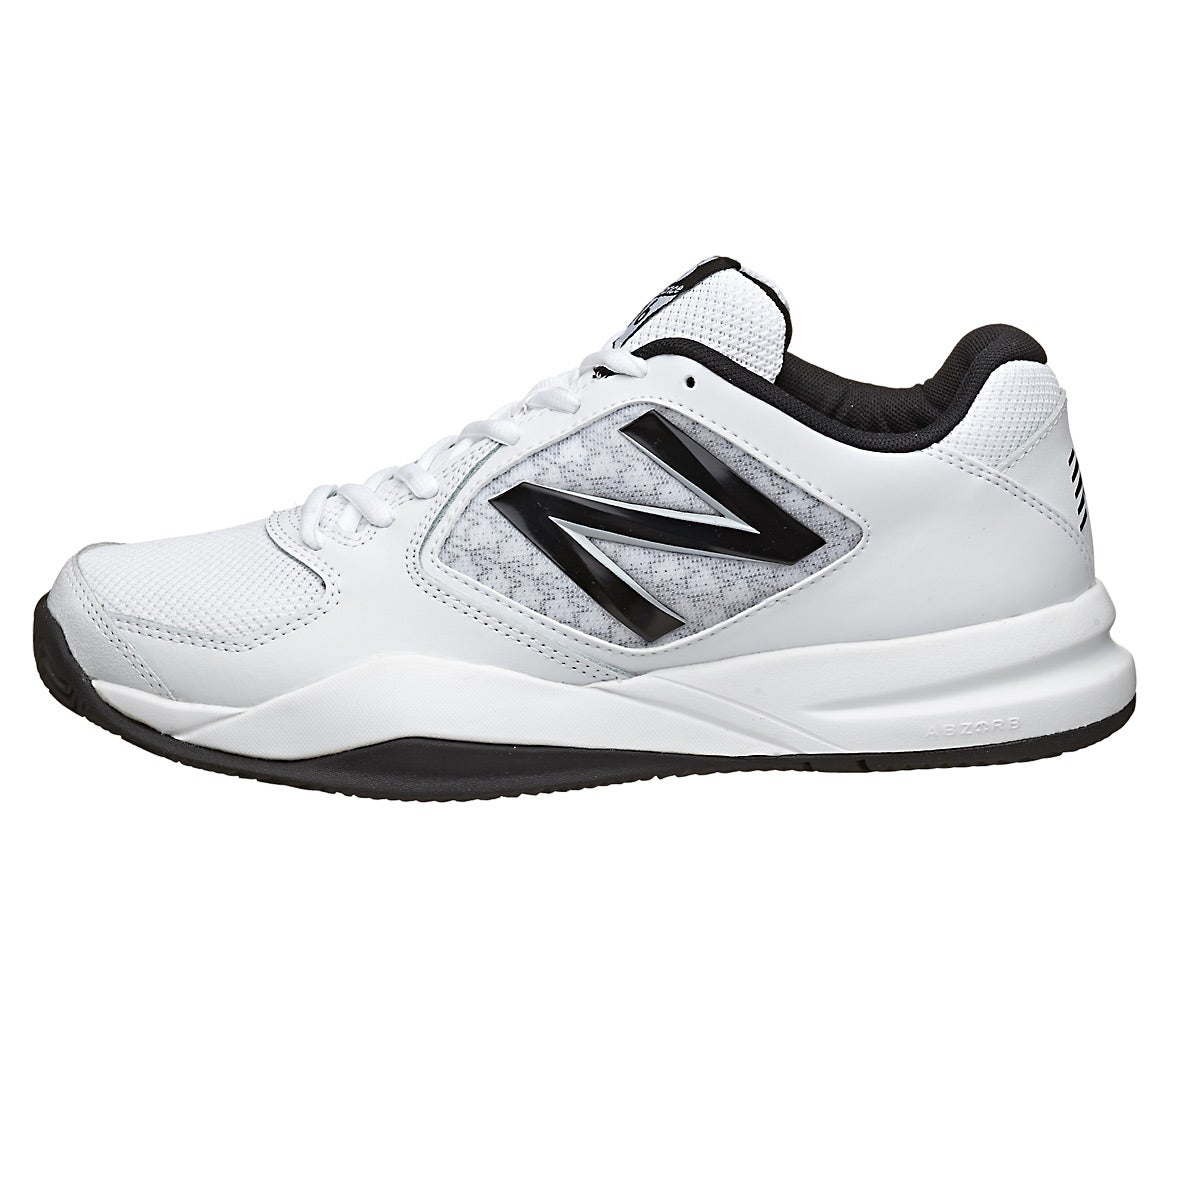 New Balance Black Tennis Shoes